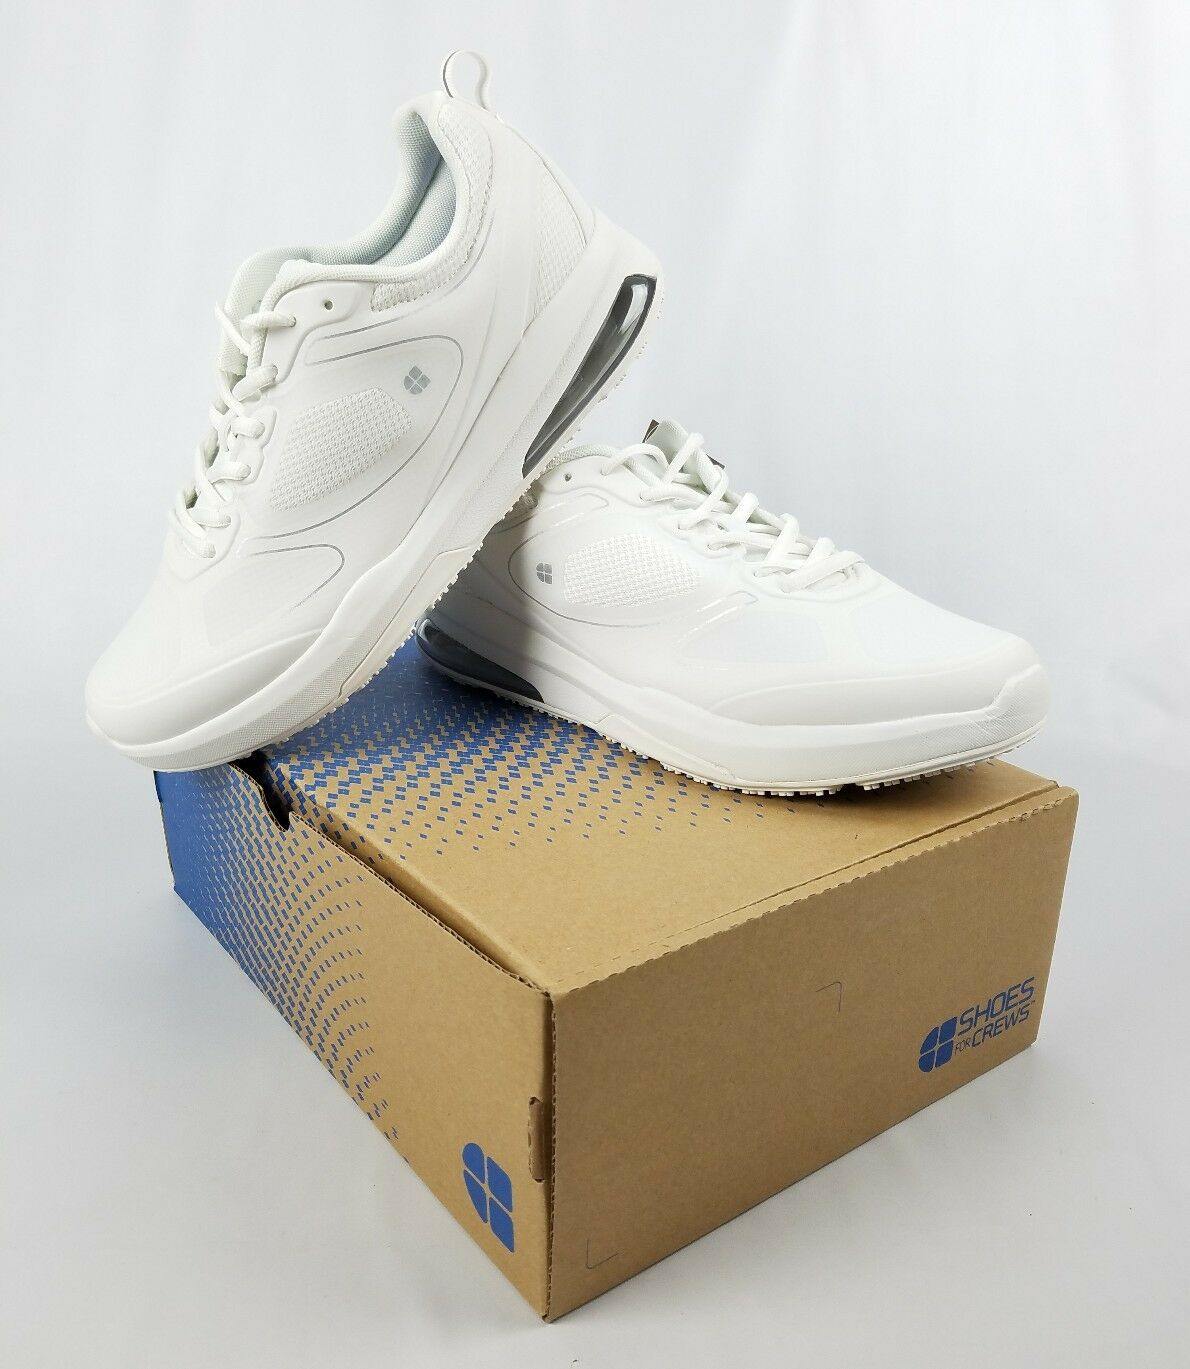 shoes For Crews Revolution II White Slip & & & Oil Resistance Womens NIB Size 10 f428c2